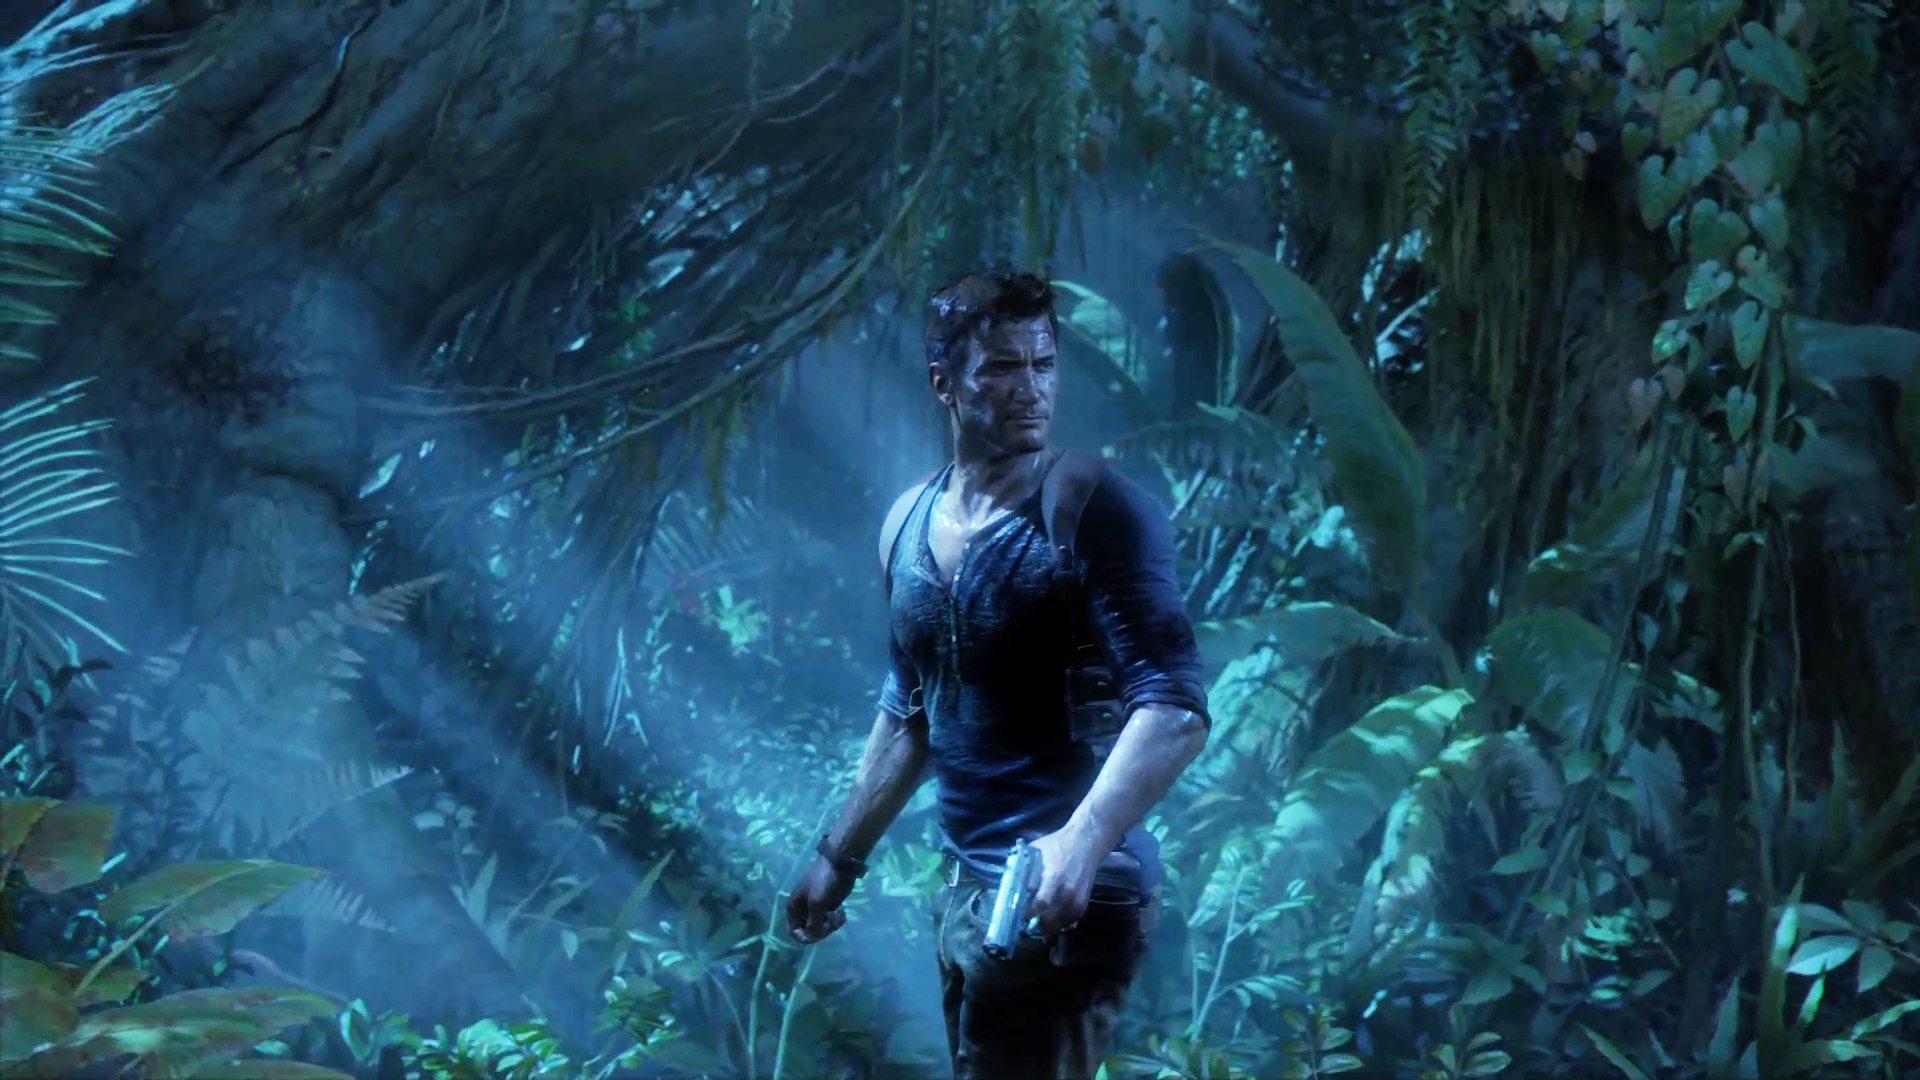 Data uscita videogioco Uncharted 4: A Thief's End